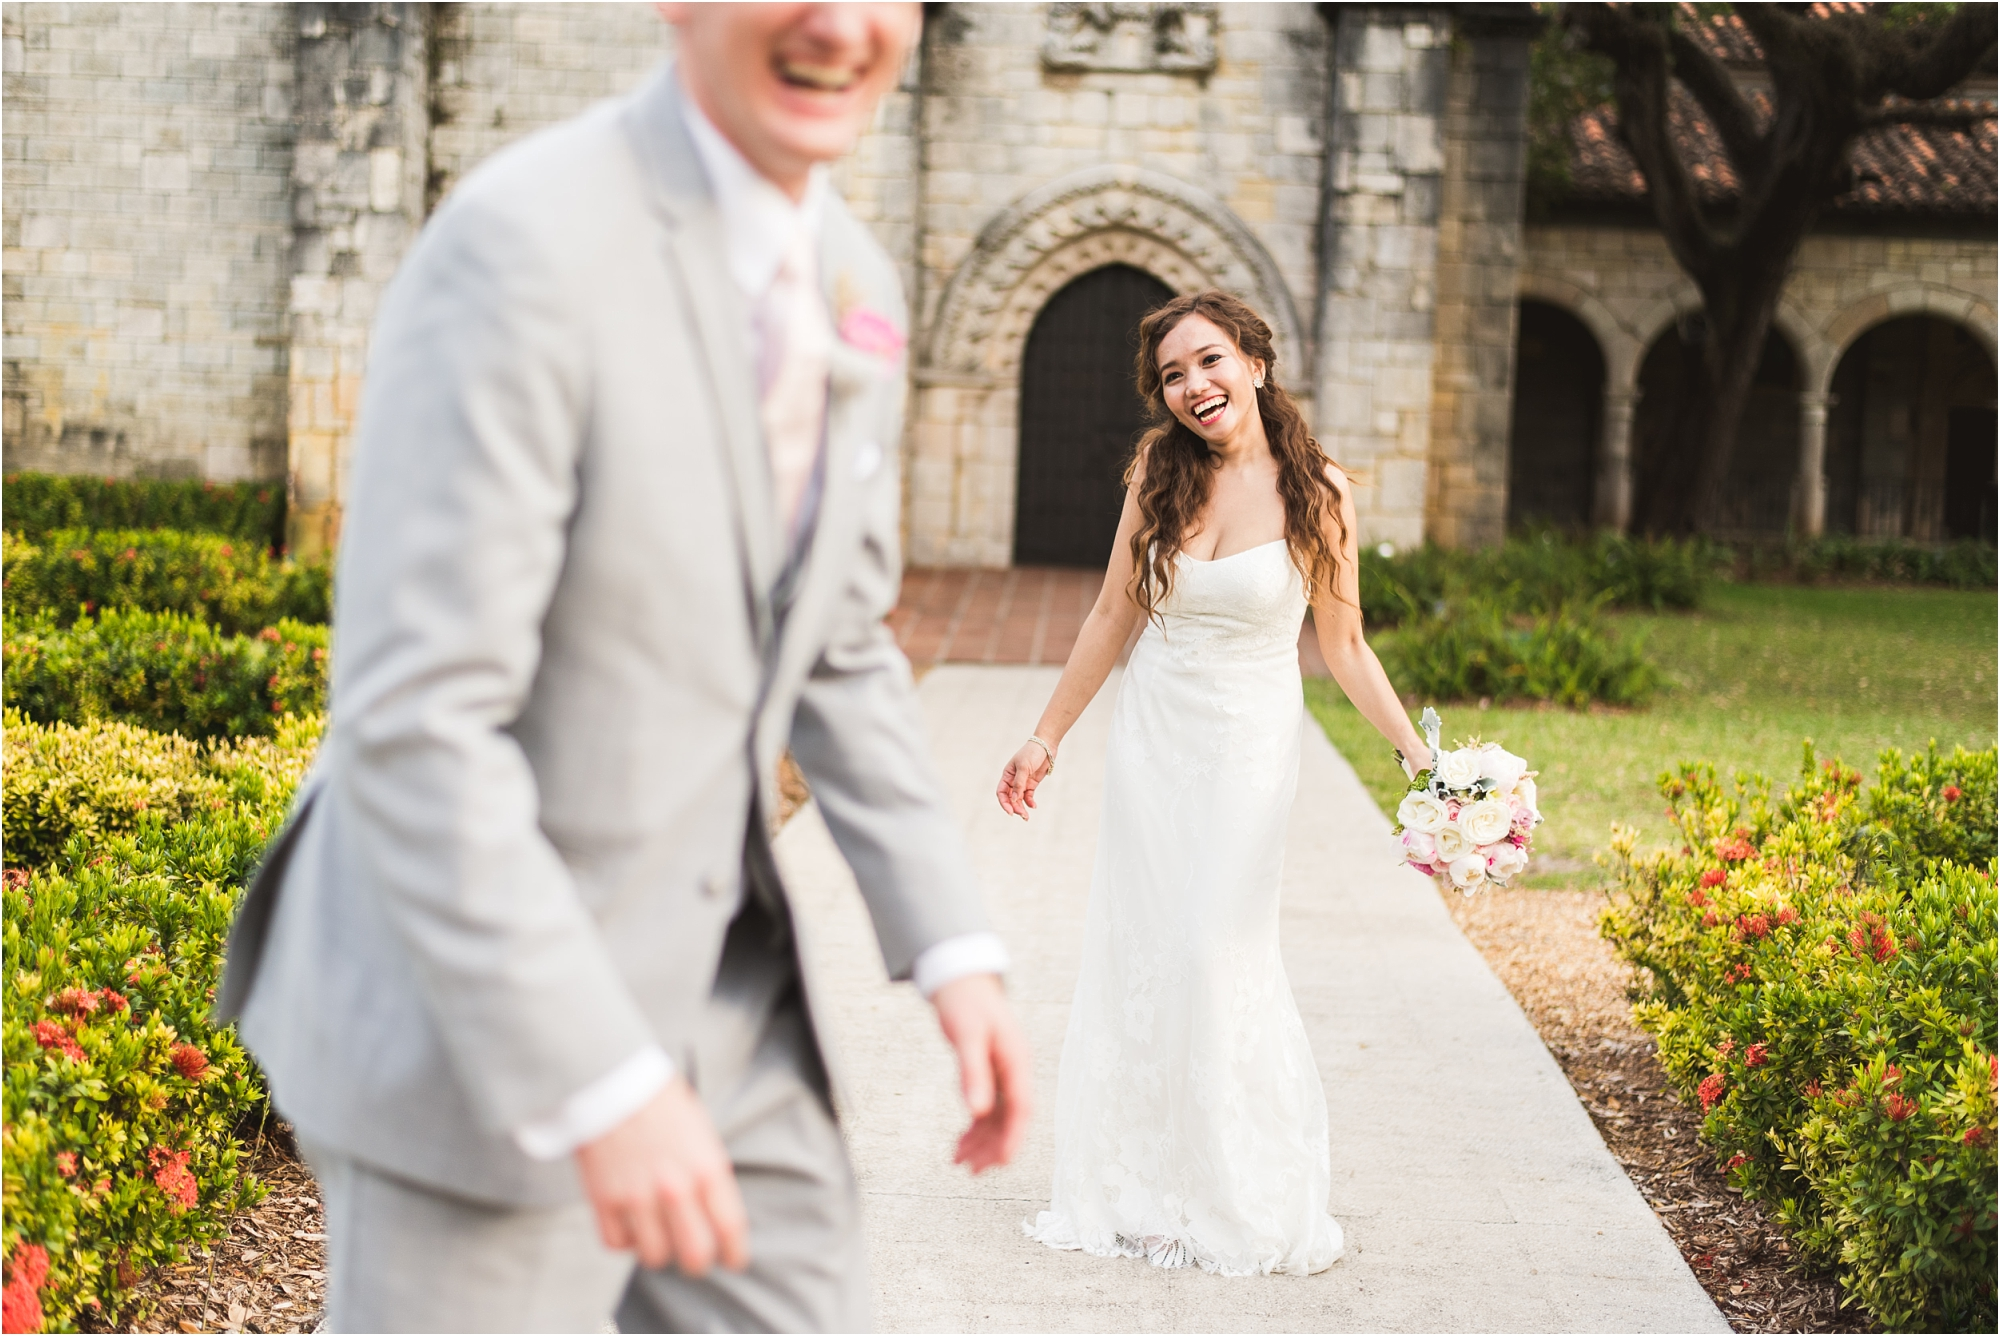 Spanish-Monastery-miami-beach-outdoor-elegant-wedding-photographer-jessenia-gonzalez_1220.jpg